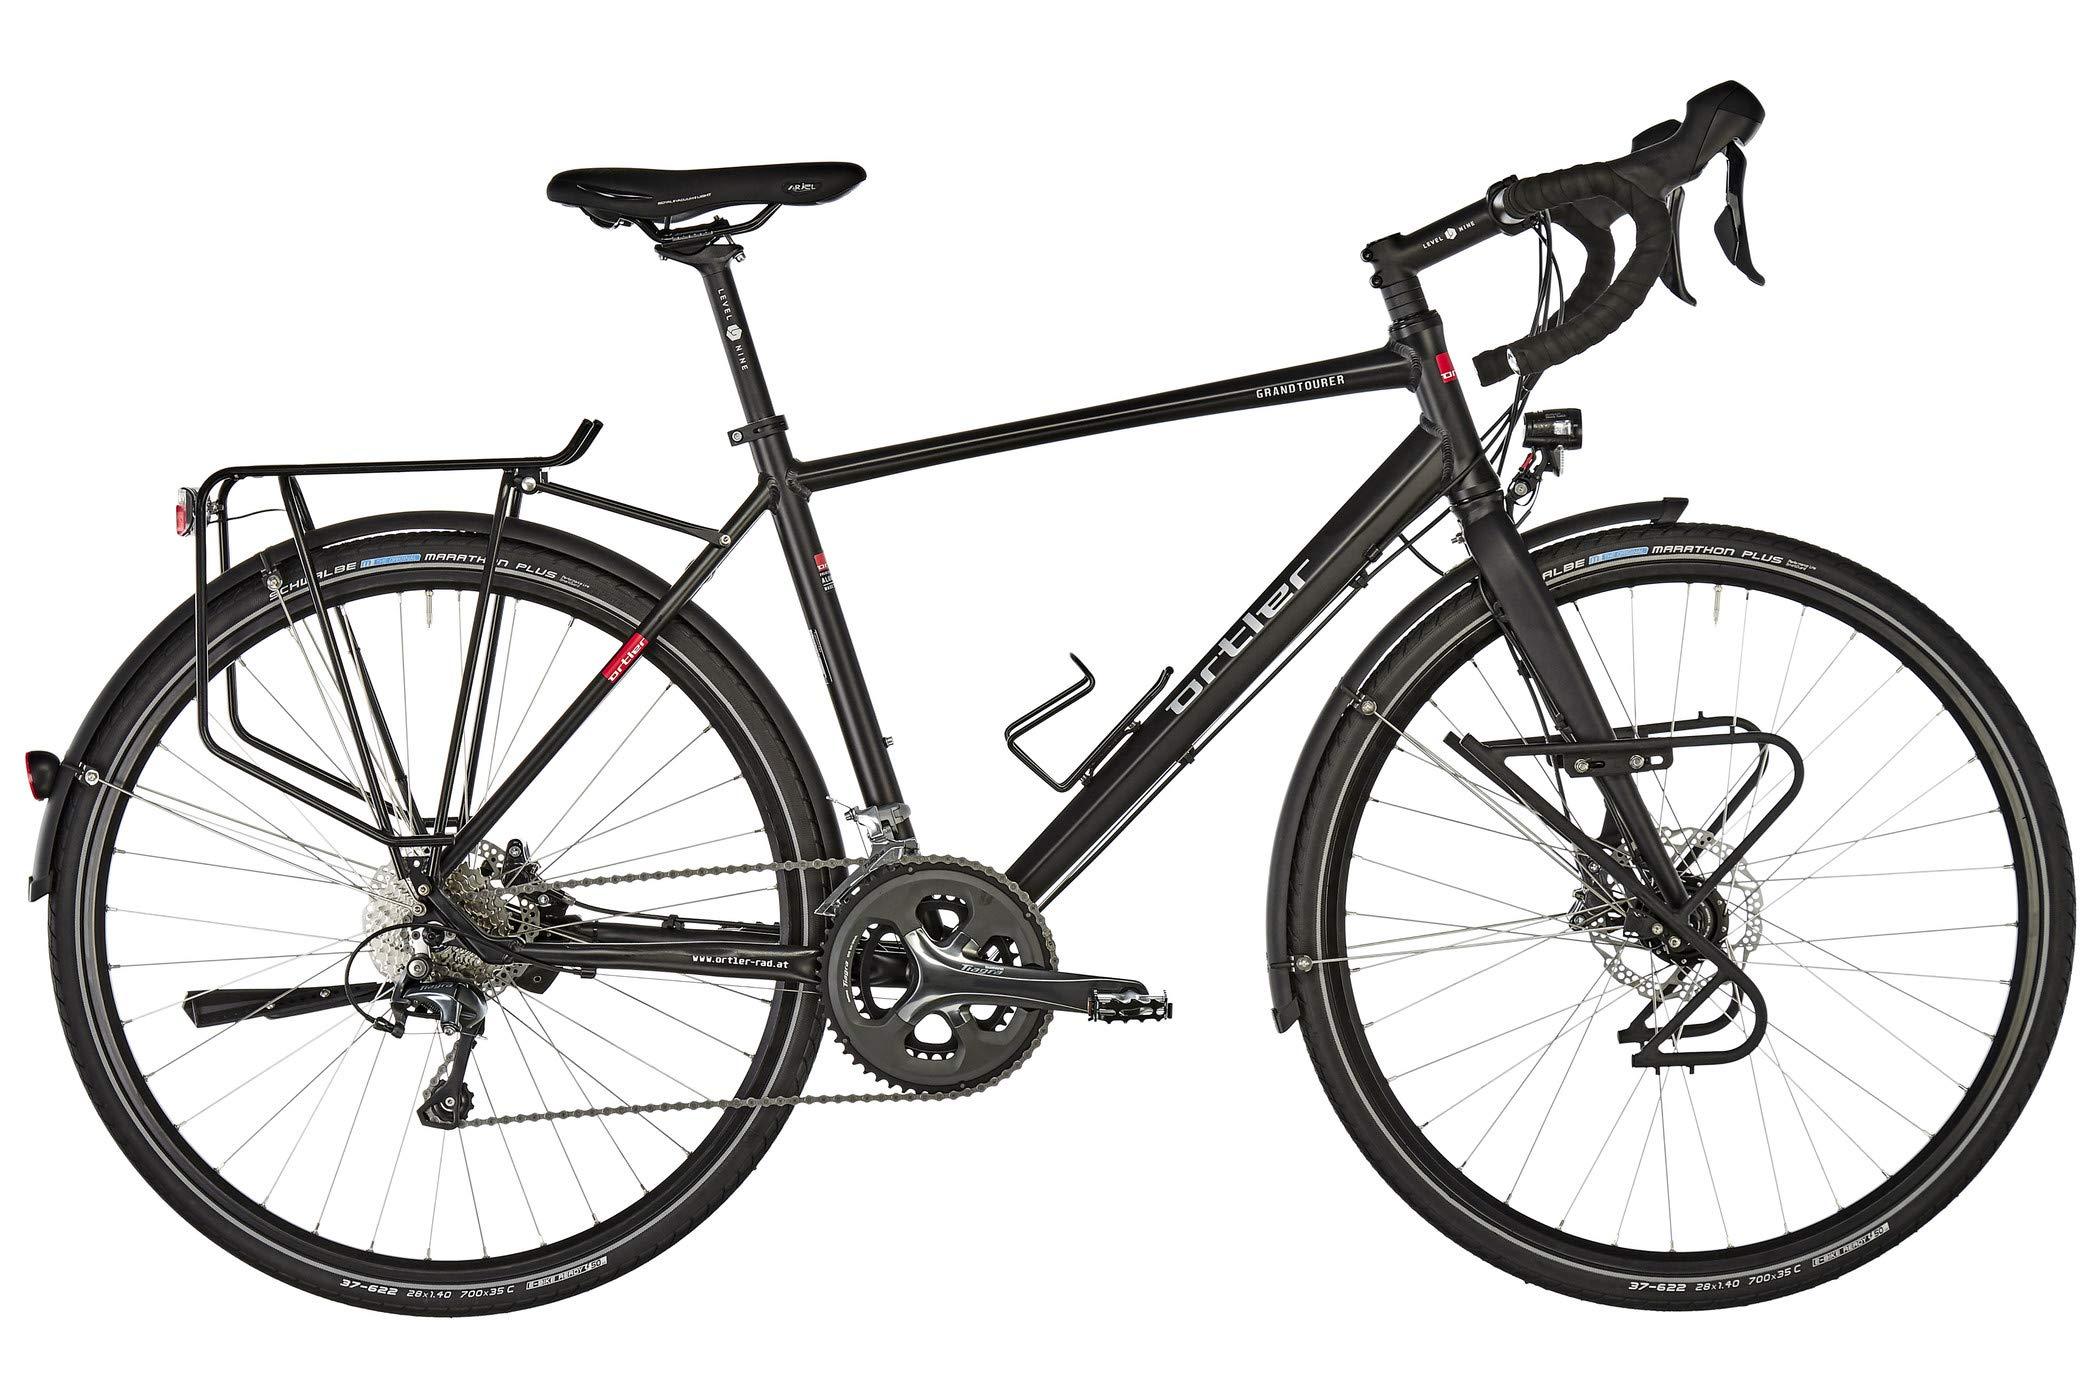 ORTLER Grandtourer EXP - Bicicletas Trekking - Negro Mate Tamaño ...